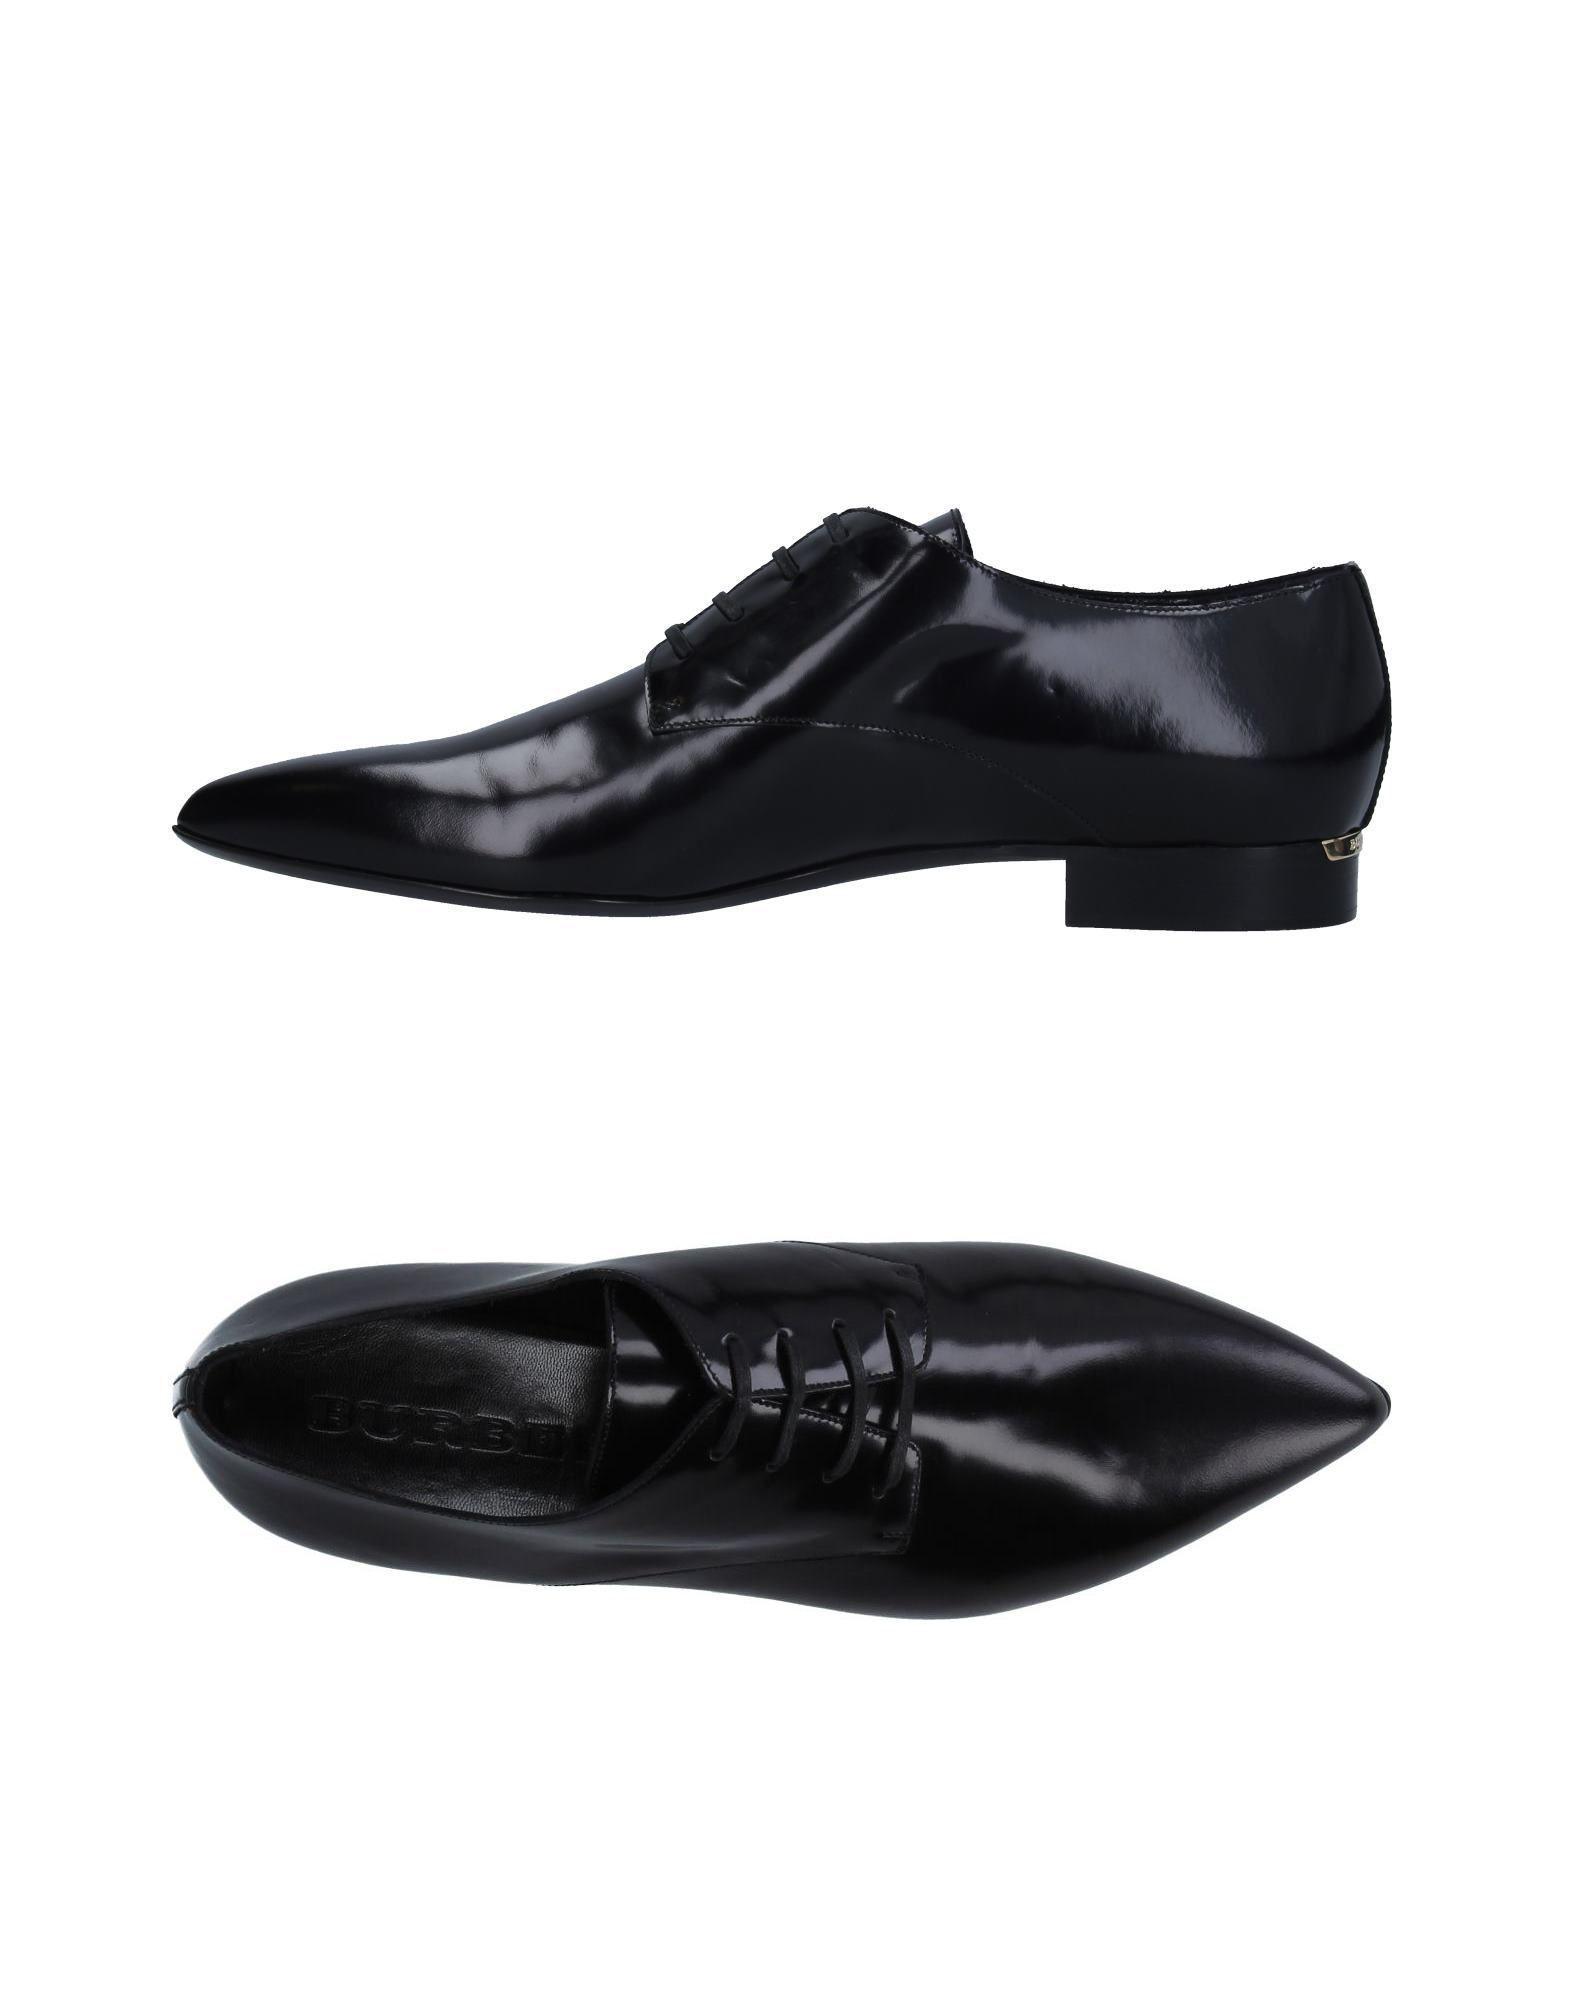 How To Re Heel Shoe With Non Solid Heel